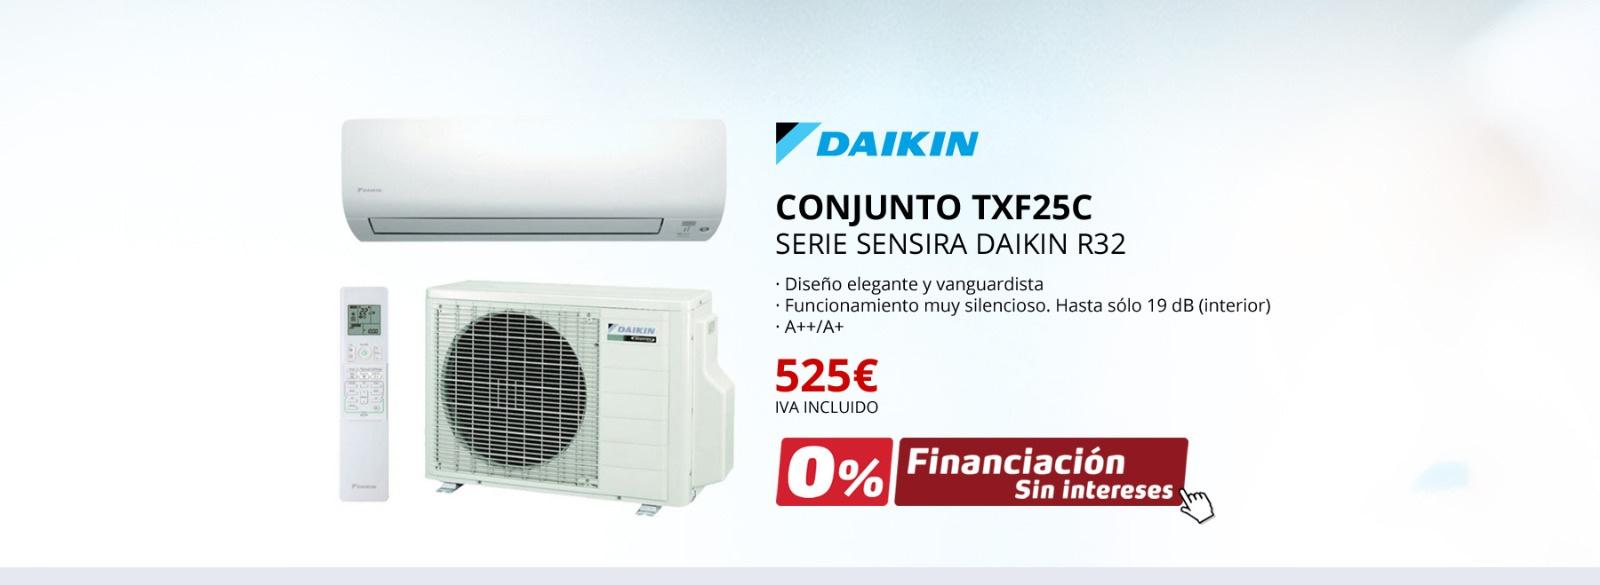 AIRE ACONDICIONADO DAIKIN TXF25C - SERIE SENSIRA DAIKIN R32